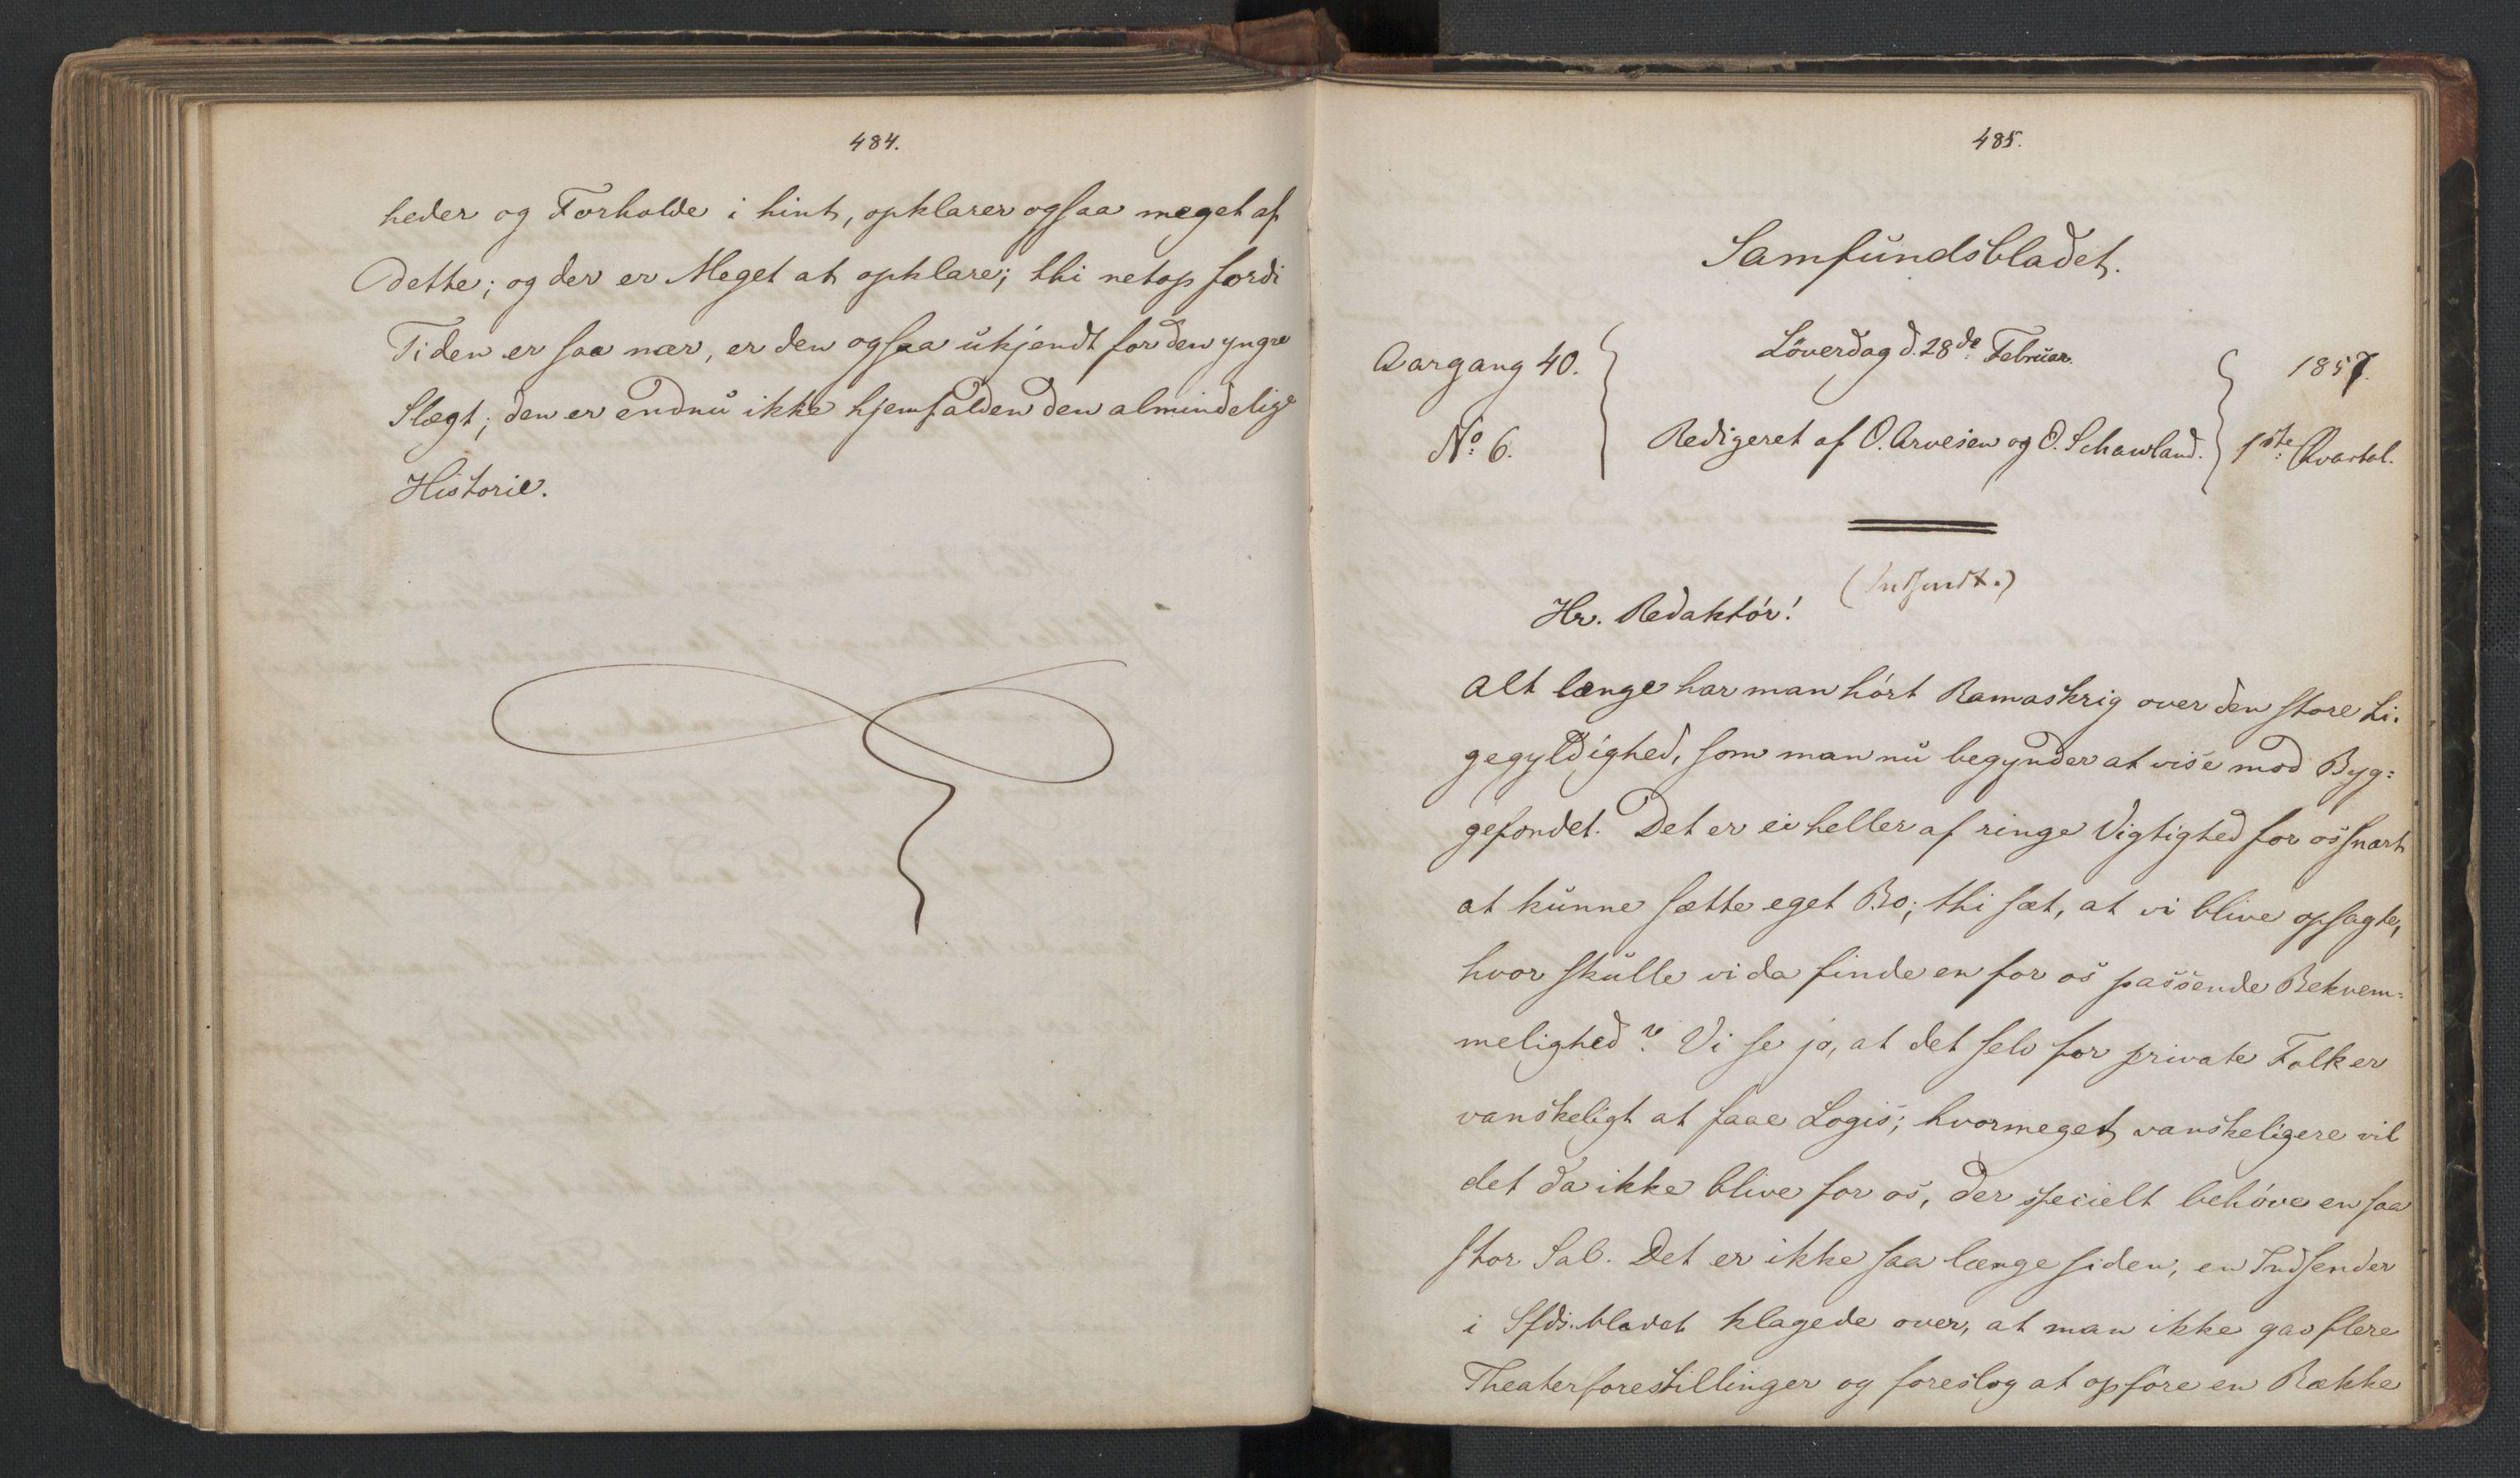 RA, Det Norske Studentersamfund, X/Xa/L0006, 1856-1857, s. 246